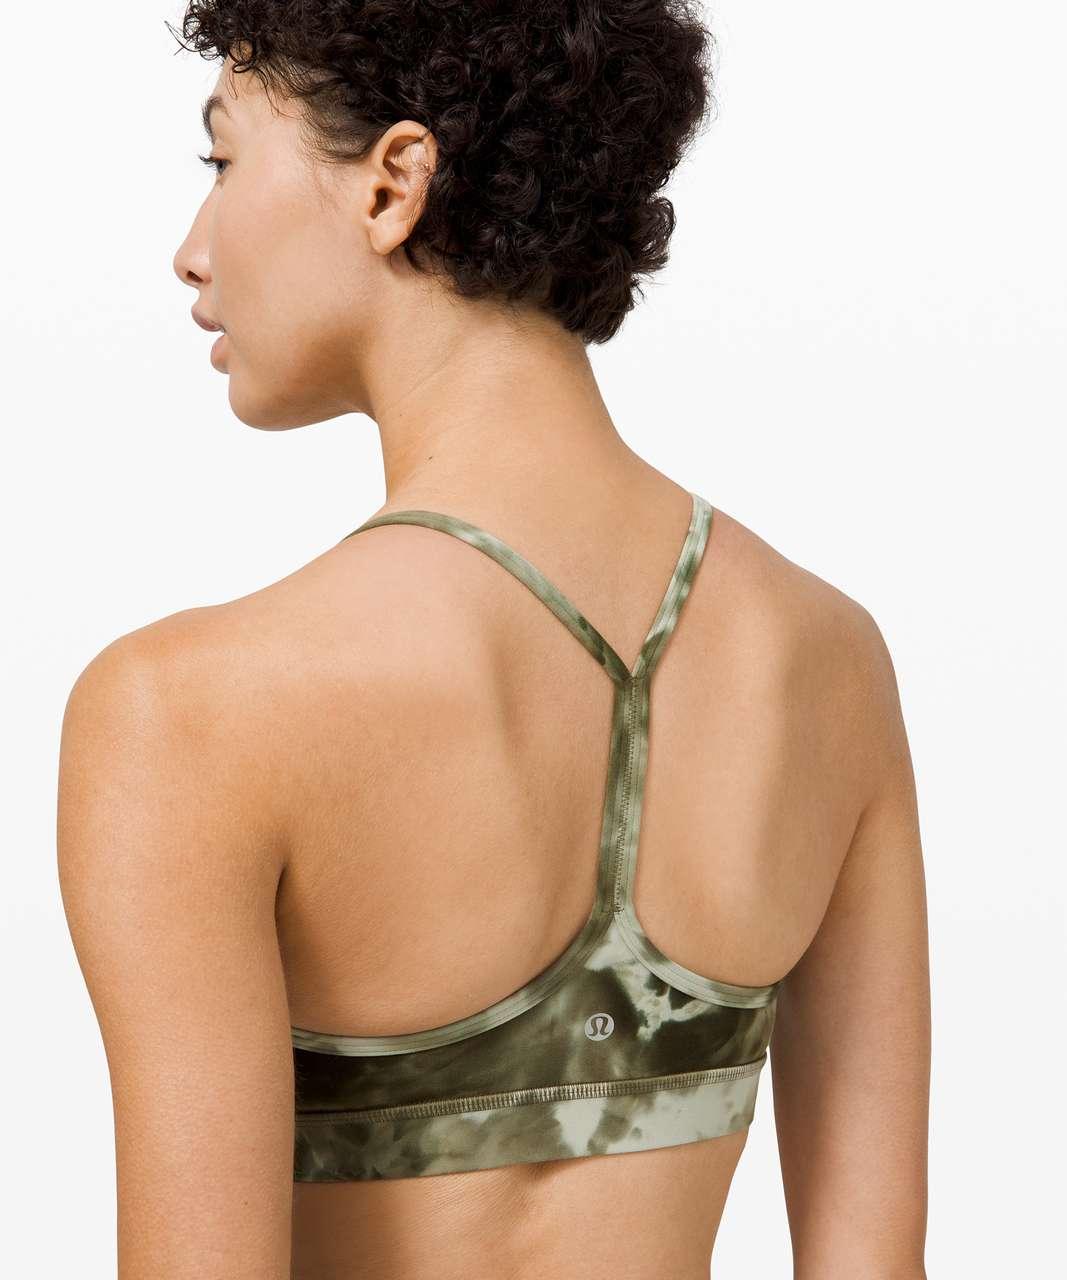 Lululemon Flow Y Bra Nulu *Light Support, B/C Cup - Diamond Dye Light Sage Army Green Dark Olive